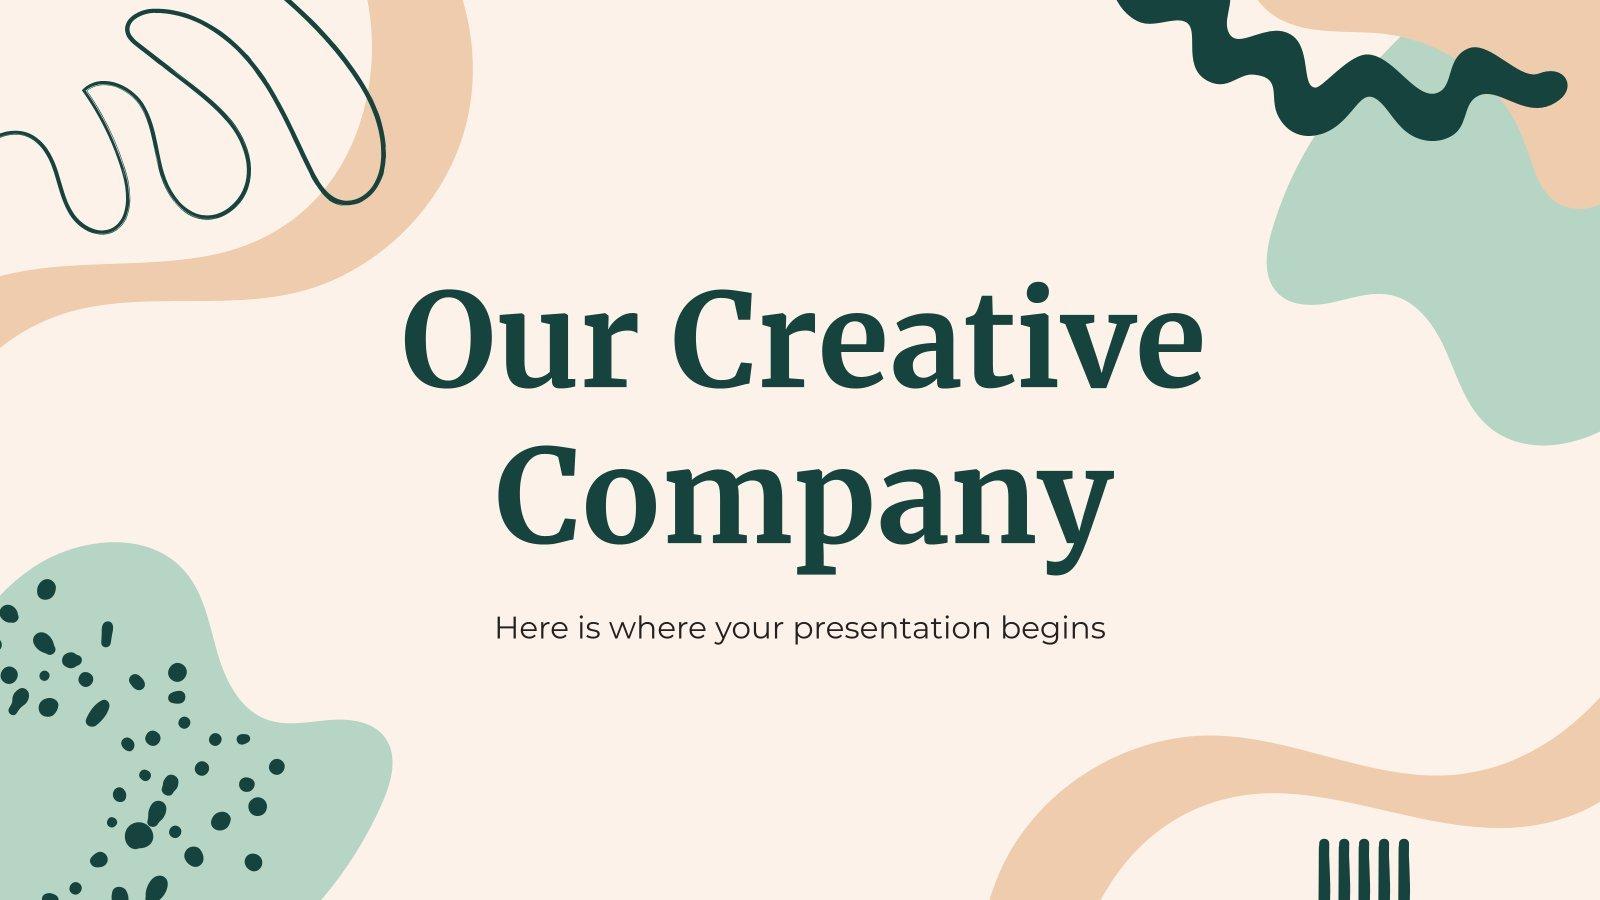 Our Creative Company presentation template